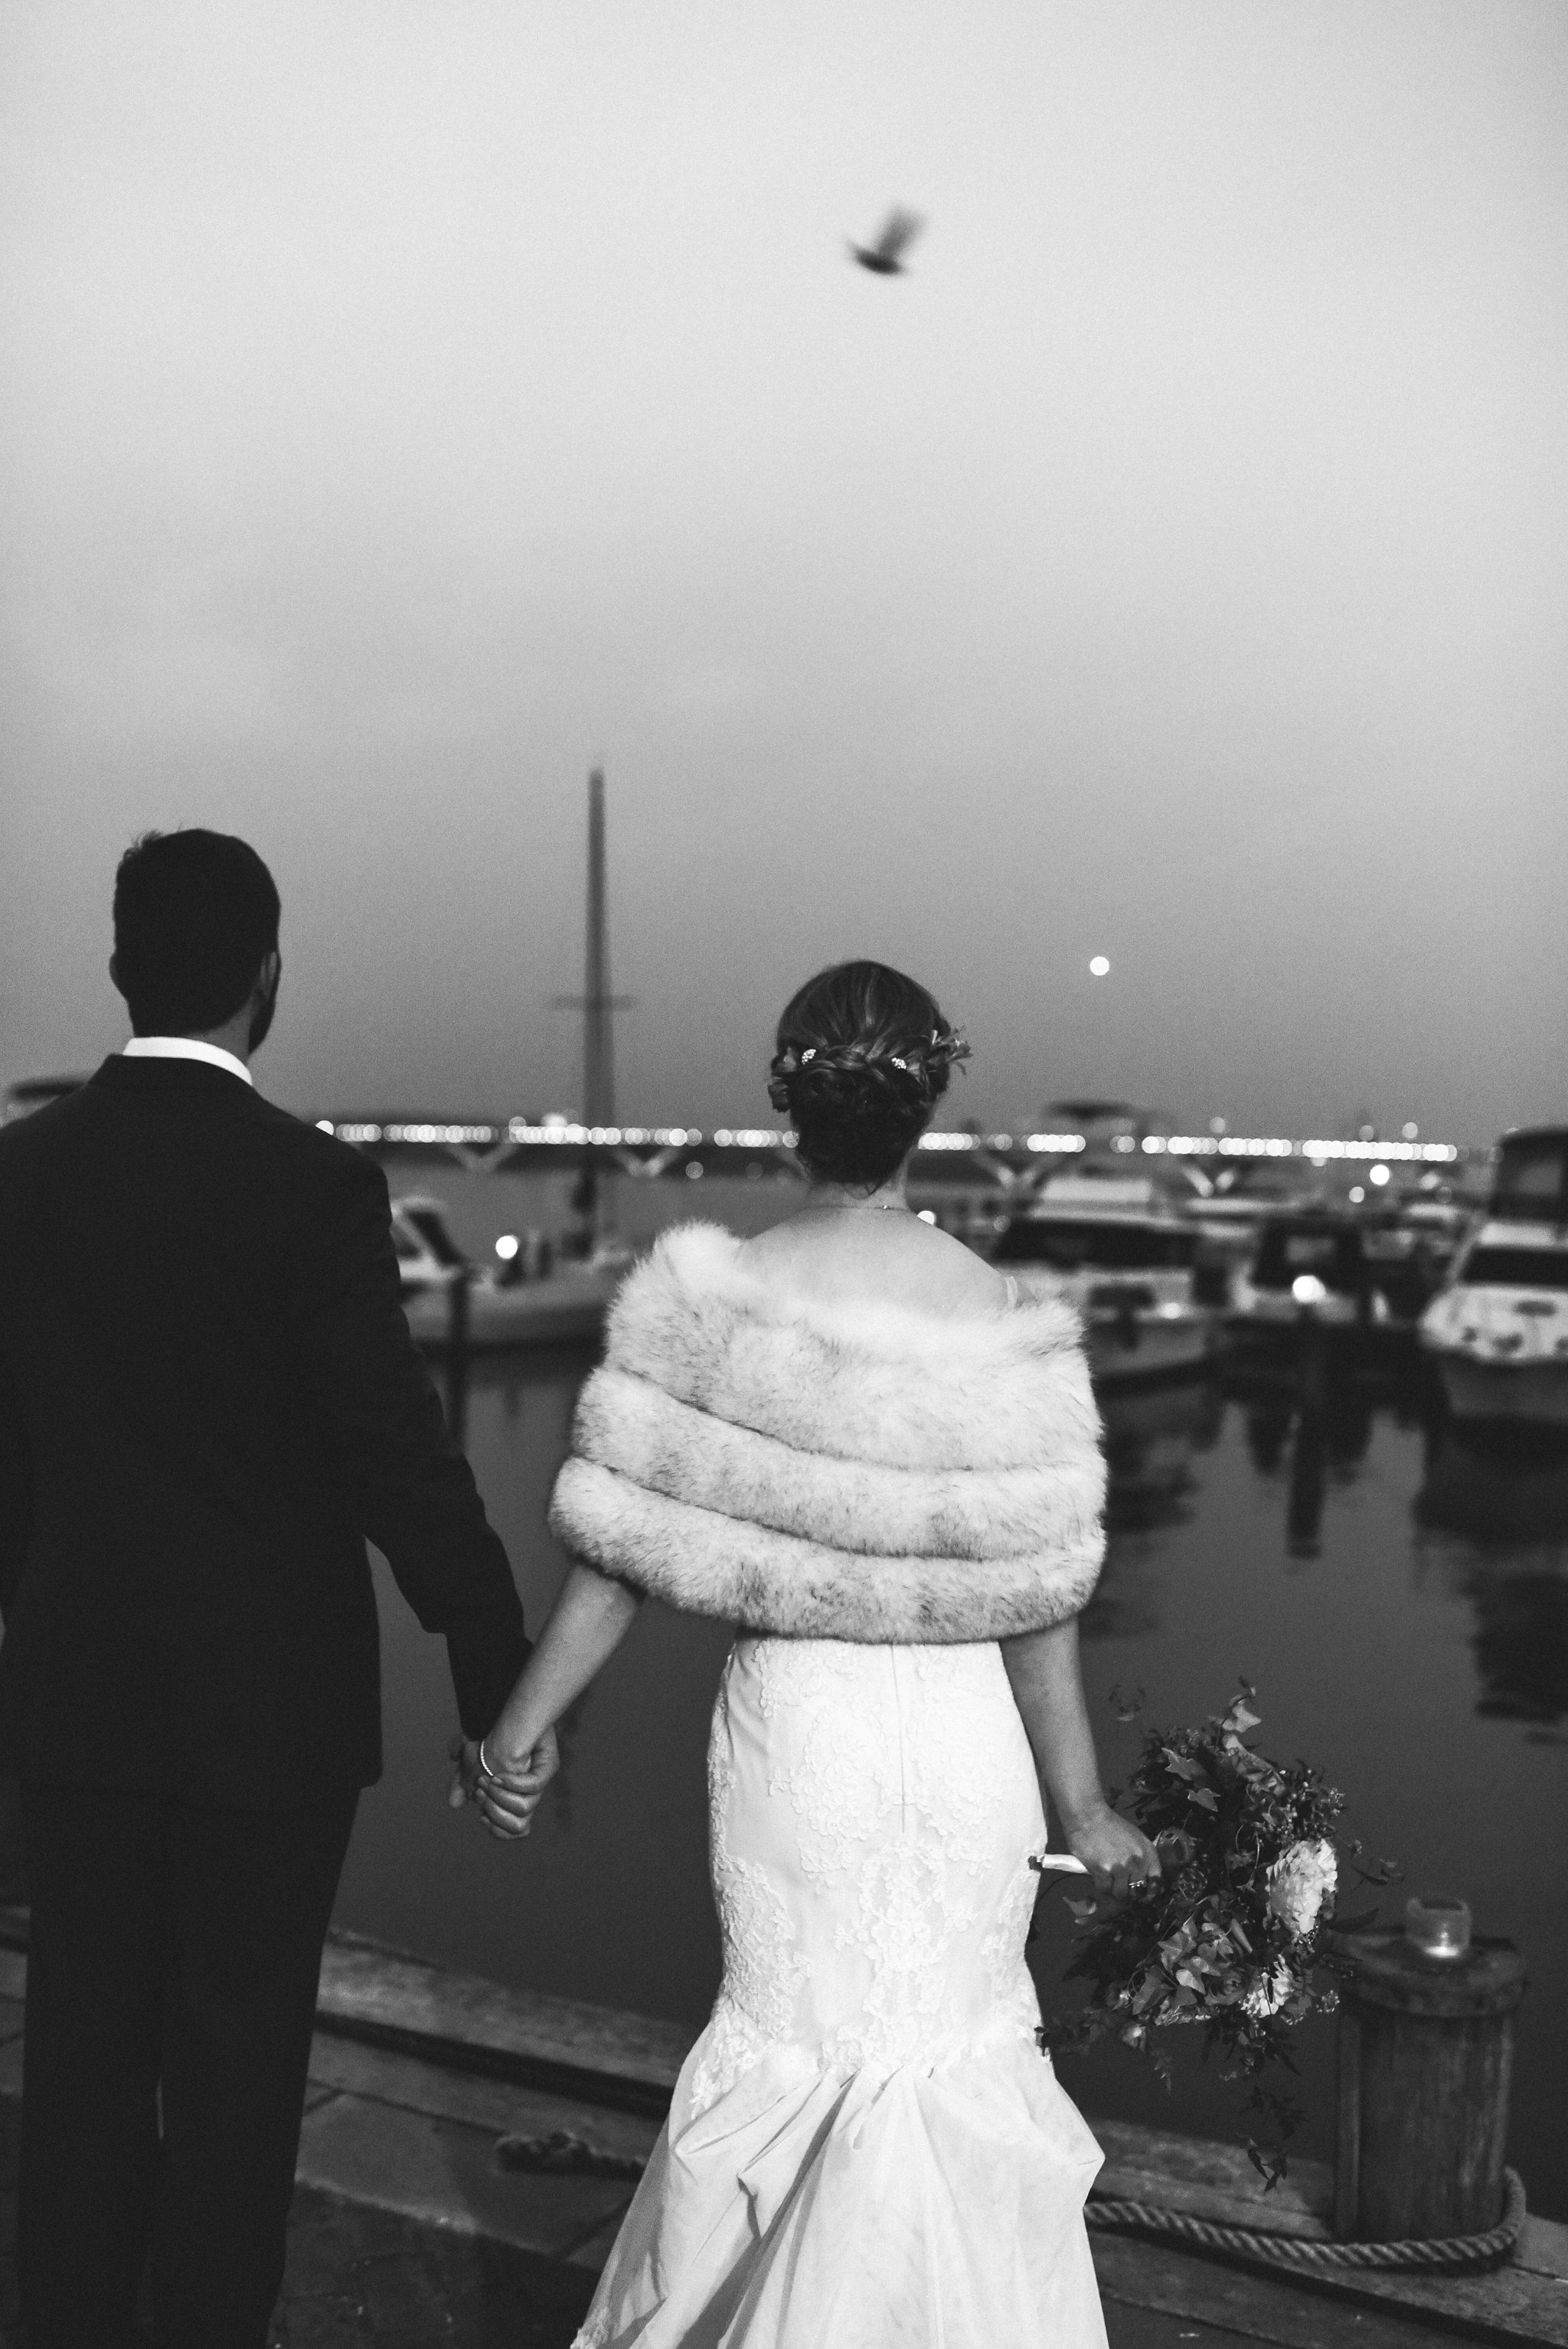 Alexandria, DC, Harbor, The London Bob Hair Design, Lian Carlo Wedding Dress, Bride and Groom, Black and White Photo, Evening Wedding, City Wedding,